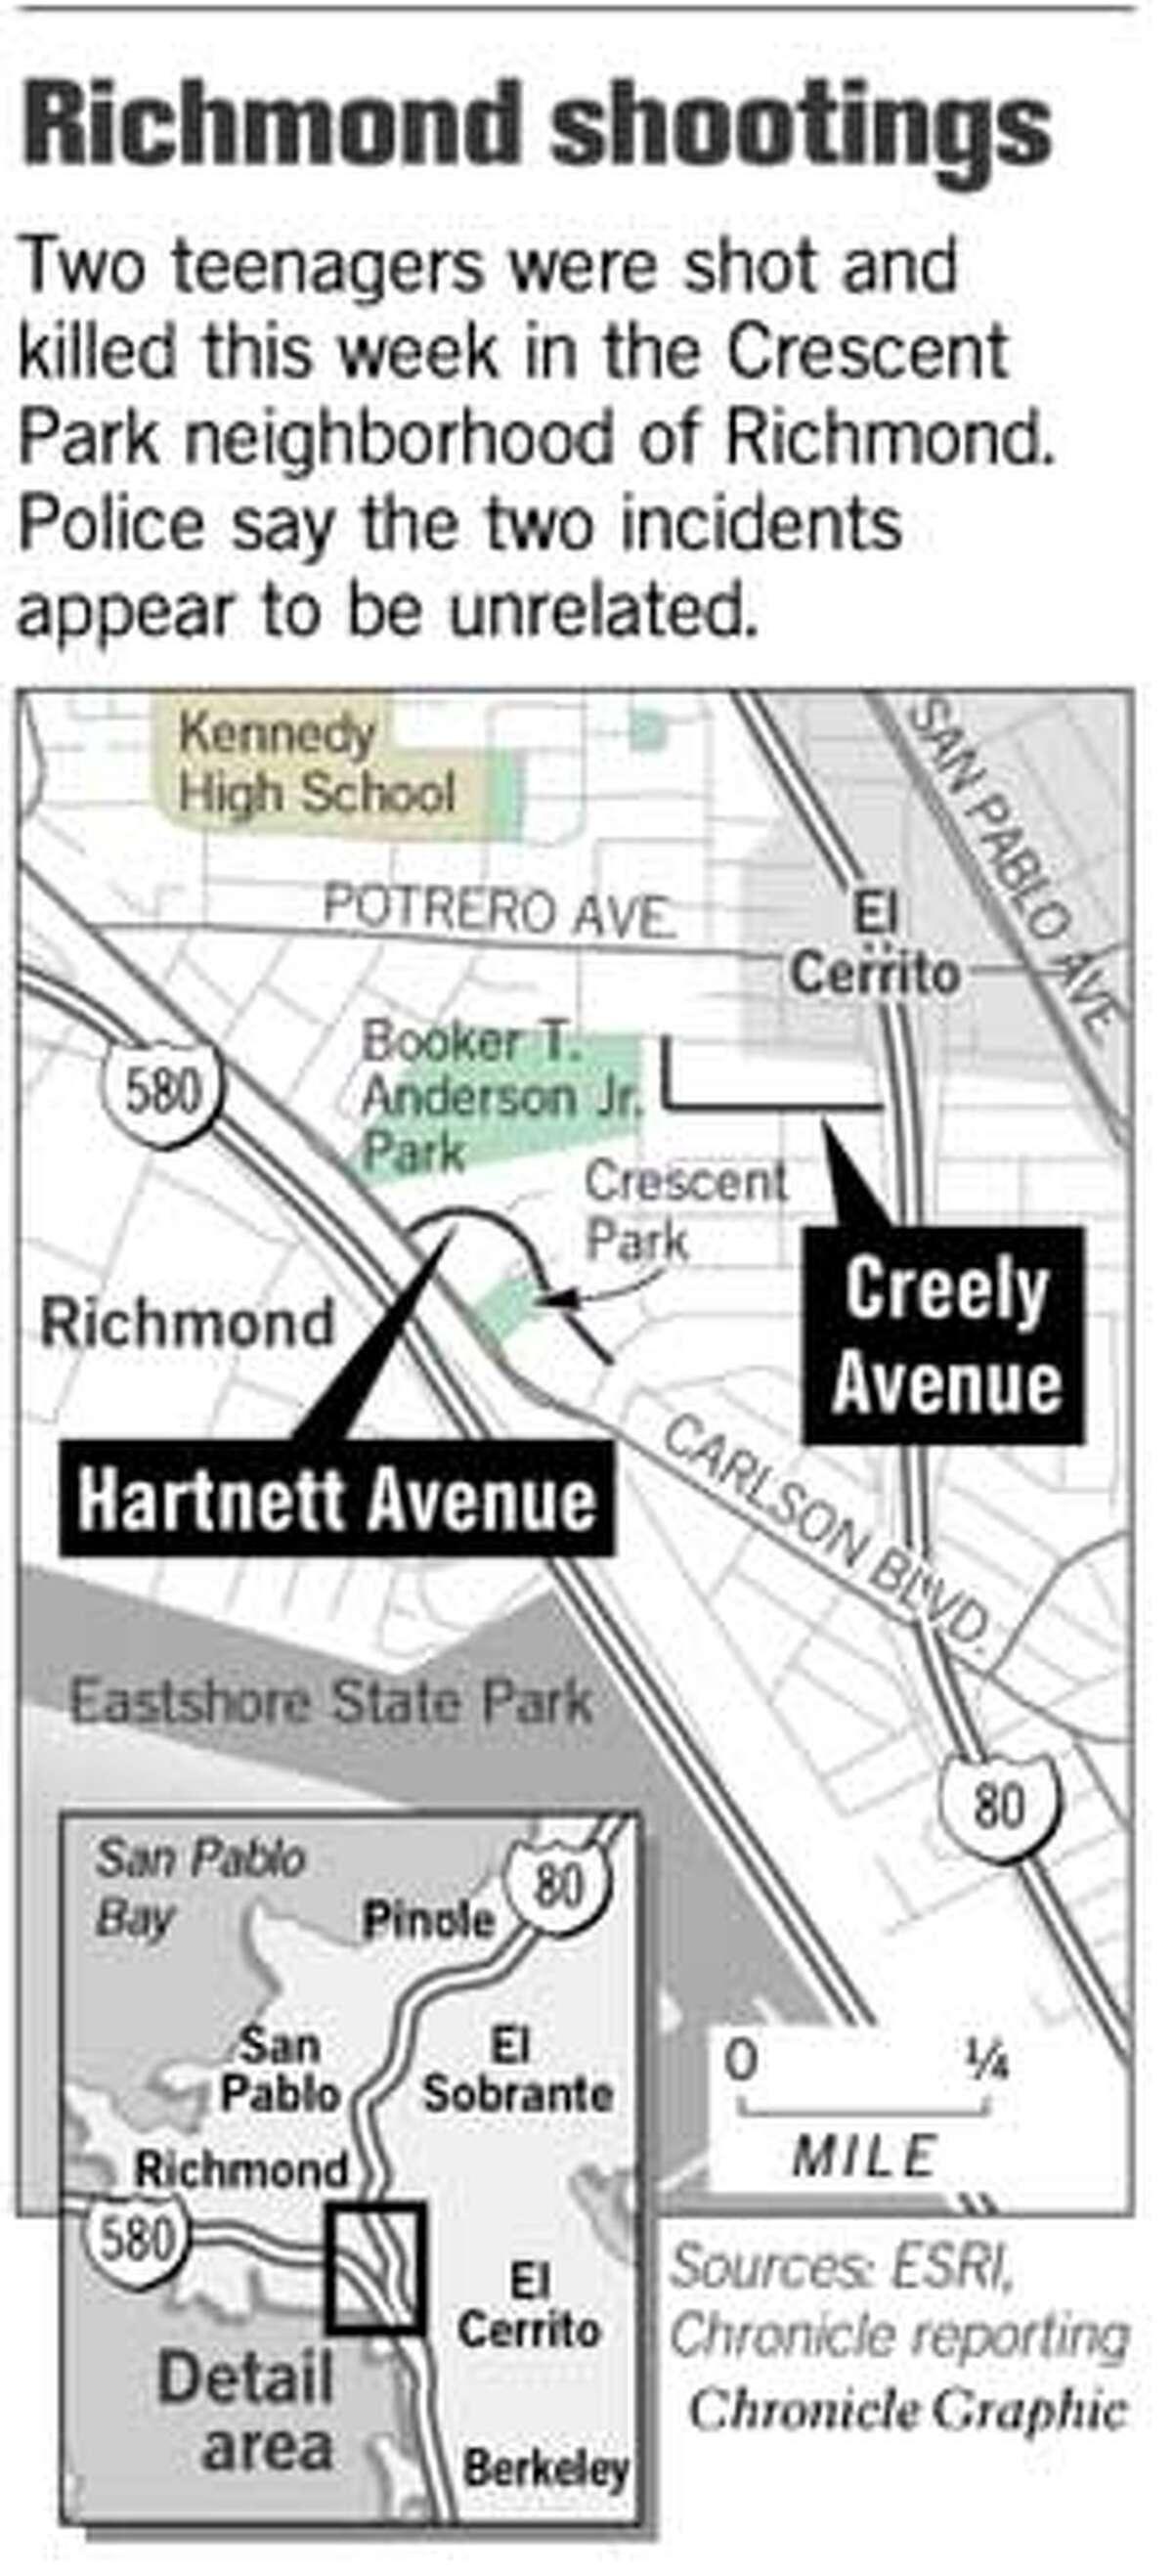 Richmond Shootings. Chronicle Graphic